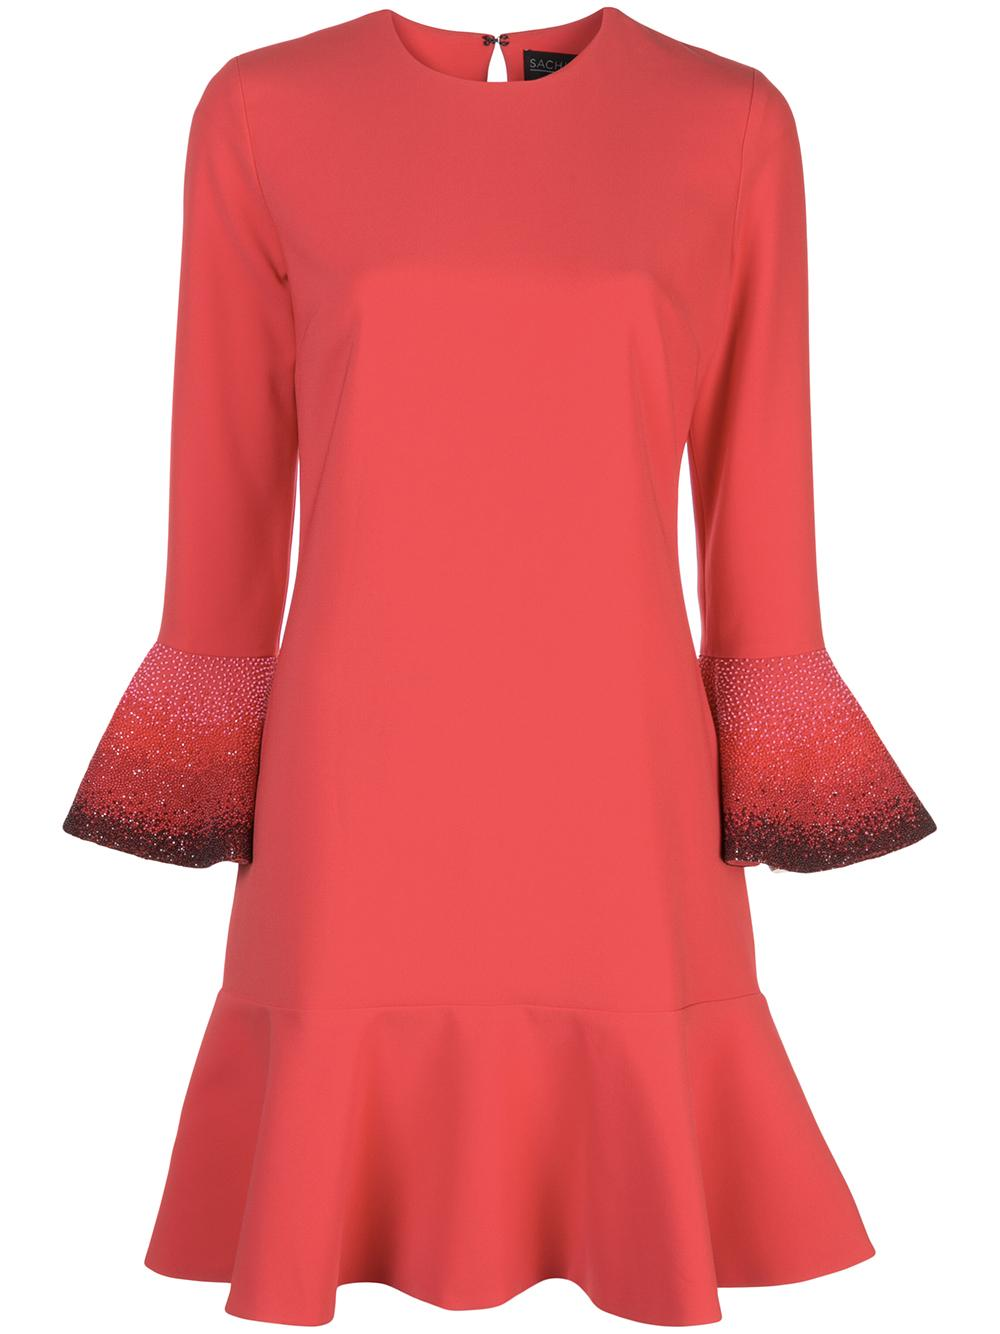 Madeleine Jewel Neck 3/4 Sleeve Shift Dress Item # T19D23